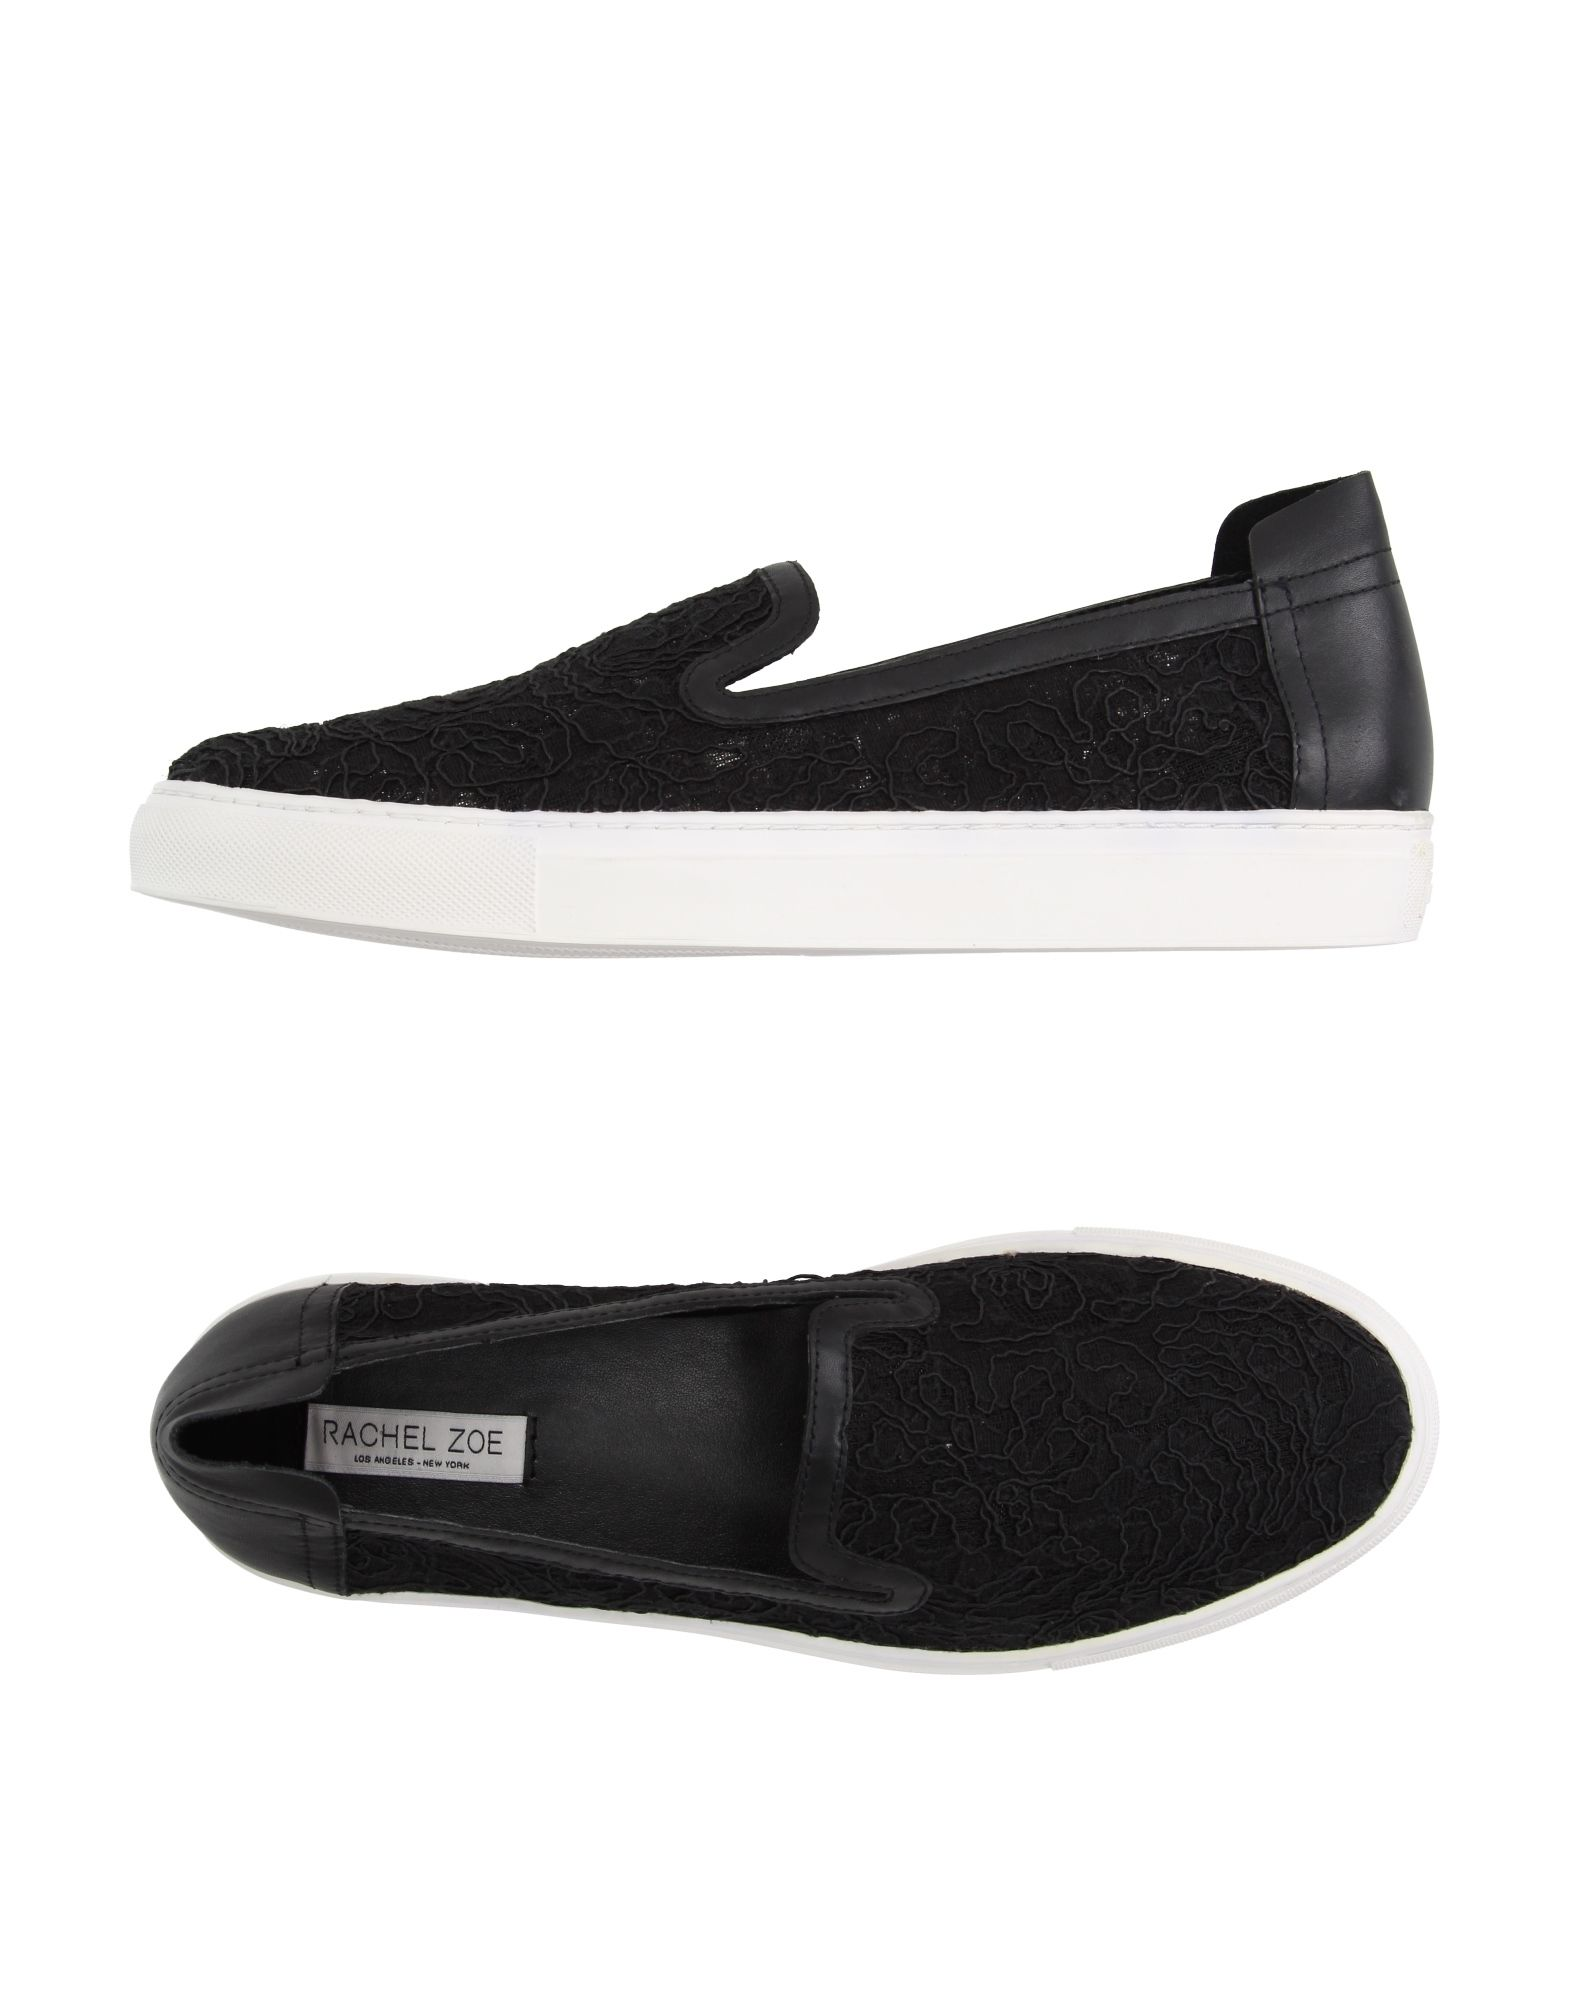 Rachel Zoe Sneakers Damen  11193676PS Gute Qualität beliebte Schuhe